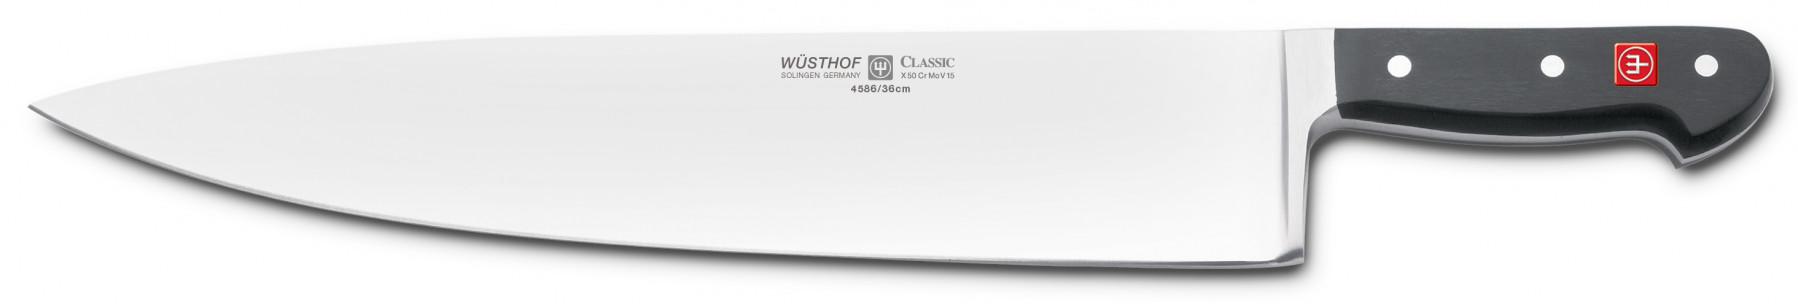 Wüsthof Dreizack Classic Kochmesser extraschwer 36cm